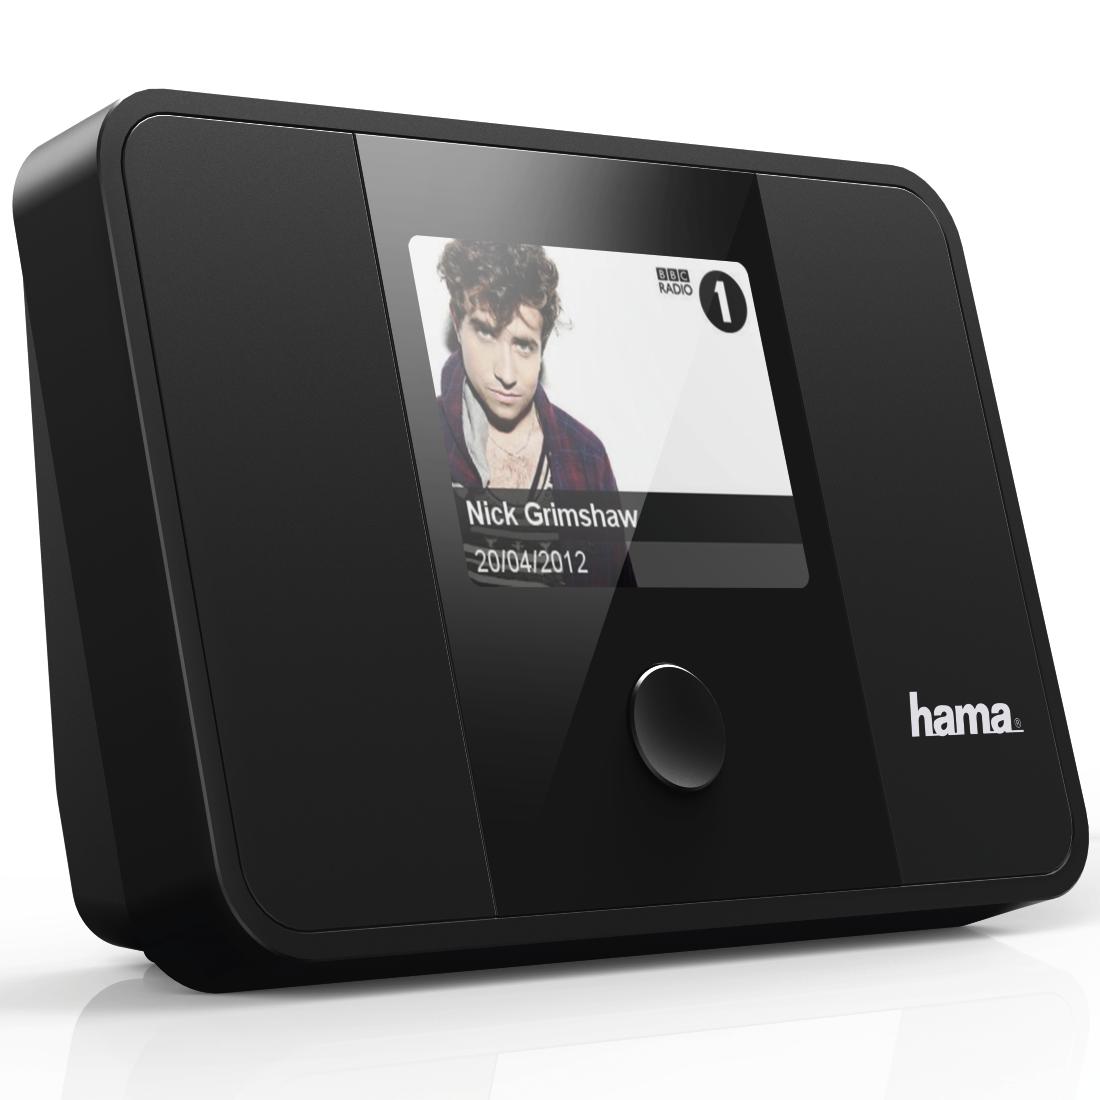 000548410000 hama tuner cyfrowy bt dab dab fm internet. Black Bedroom Furniture Sets. Home Design Ideas